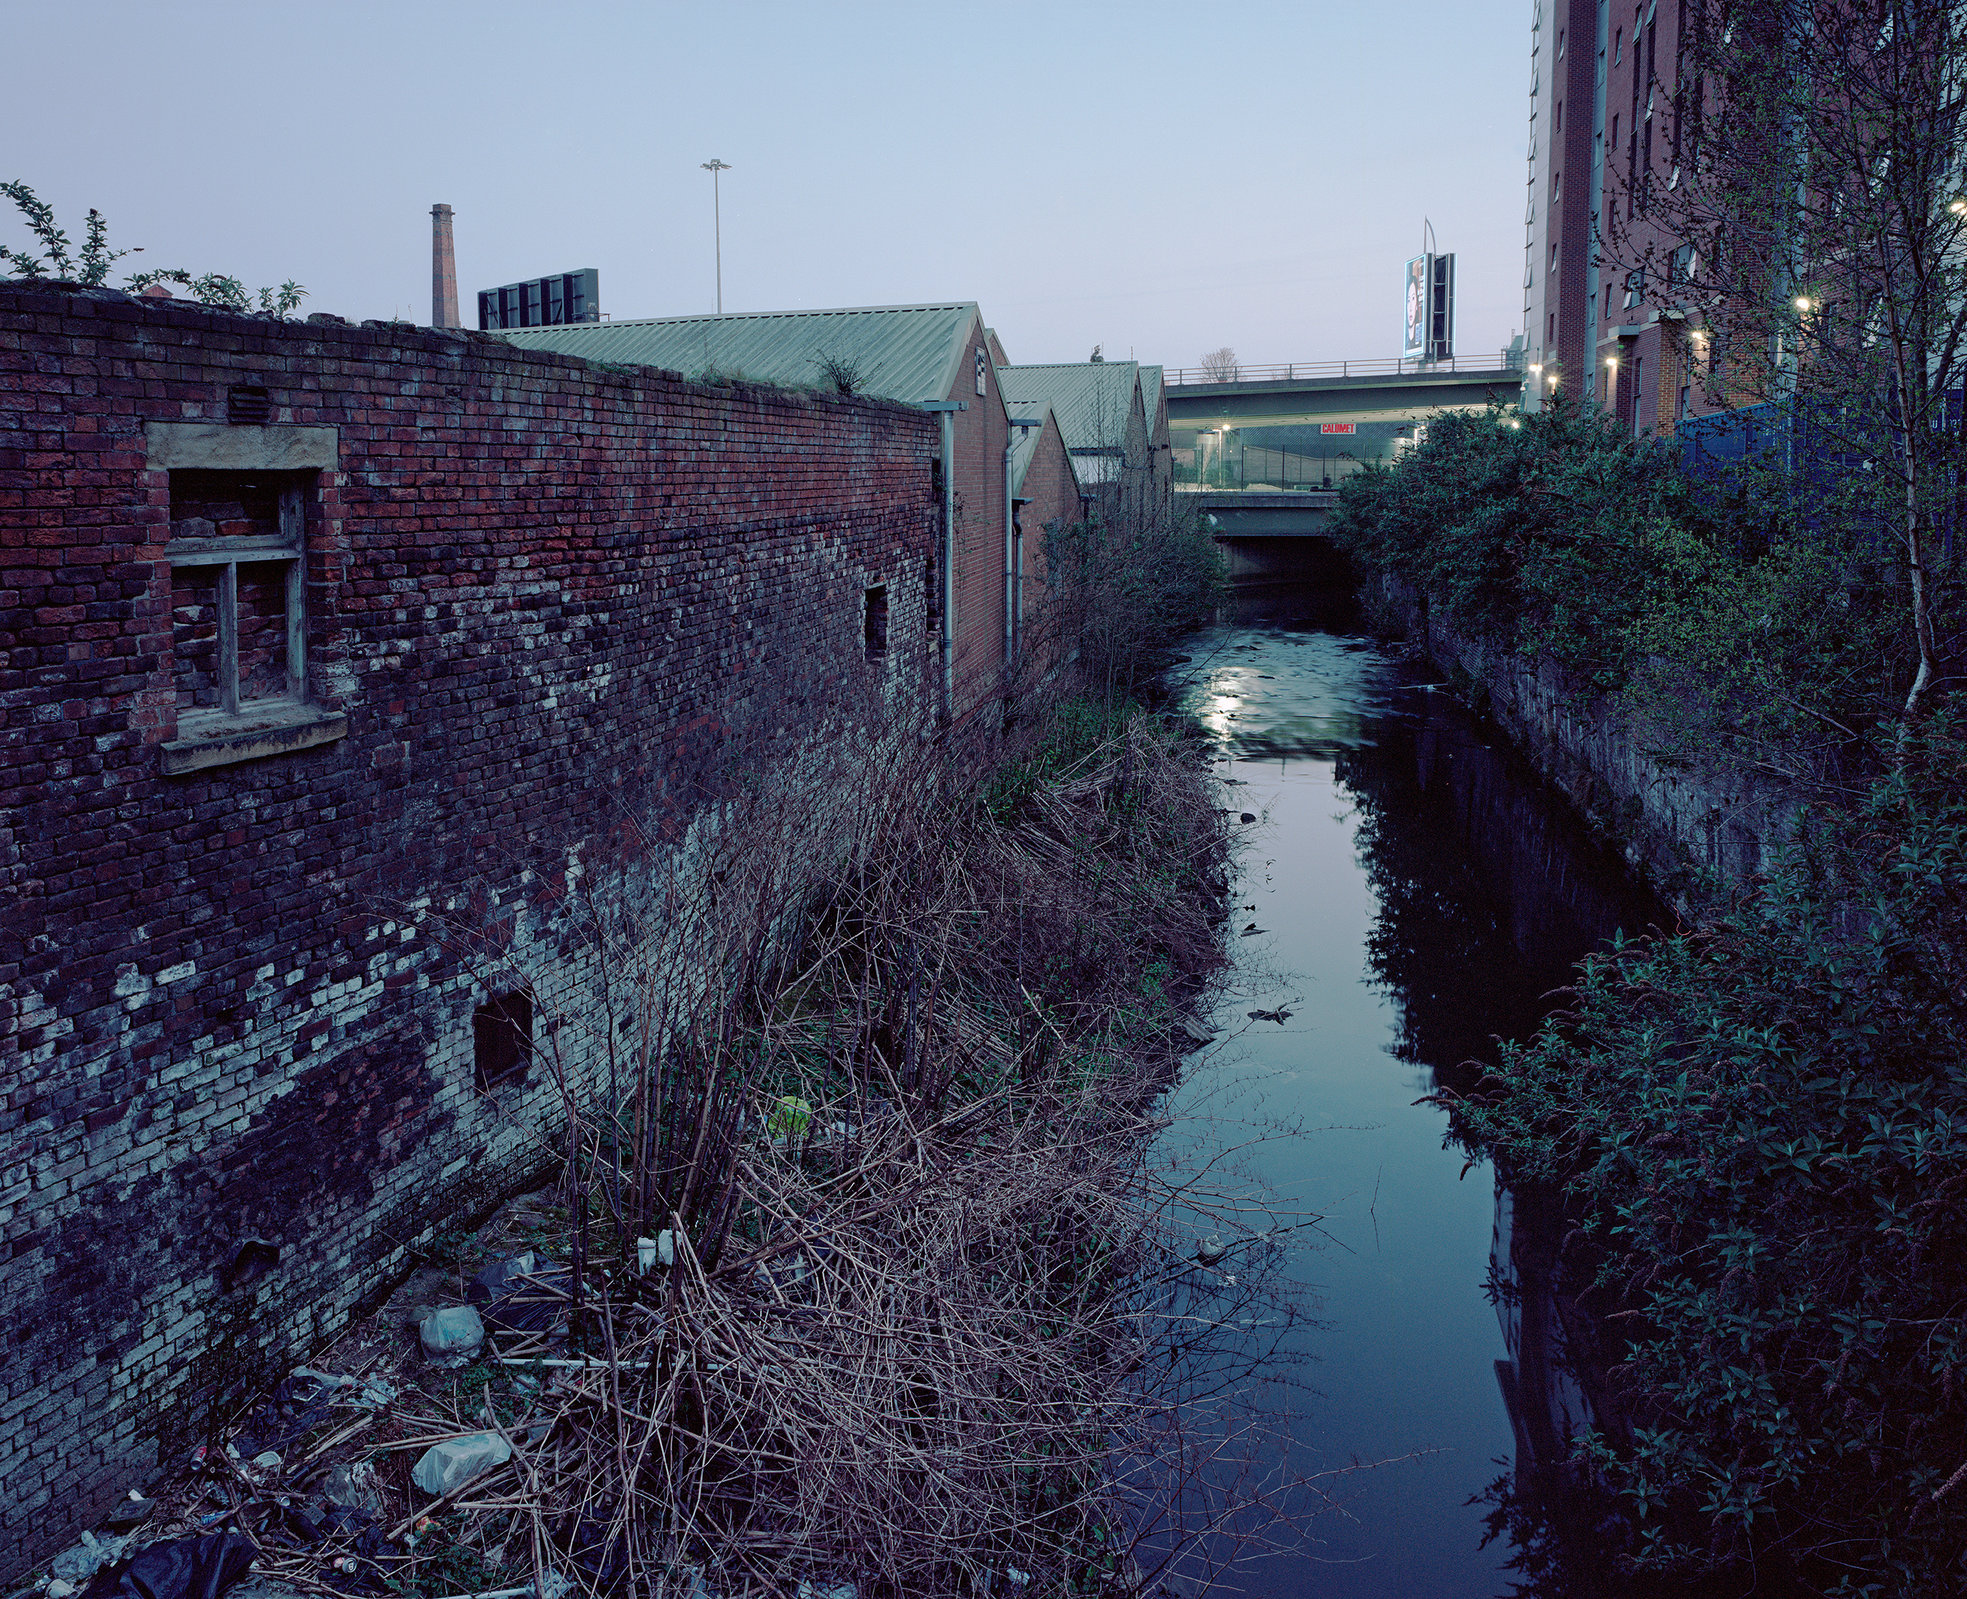 River Medlock, Manchester